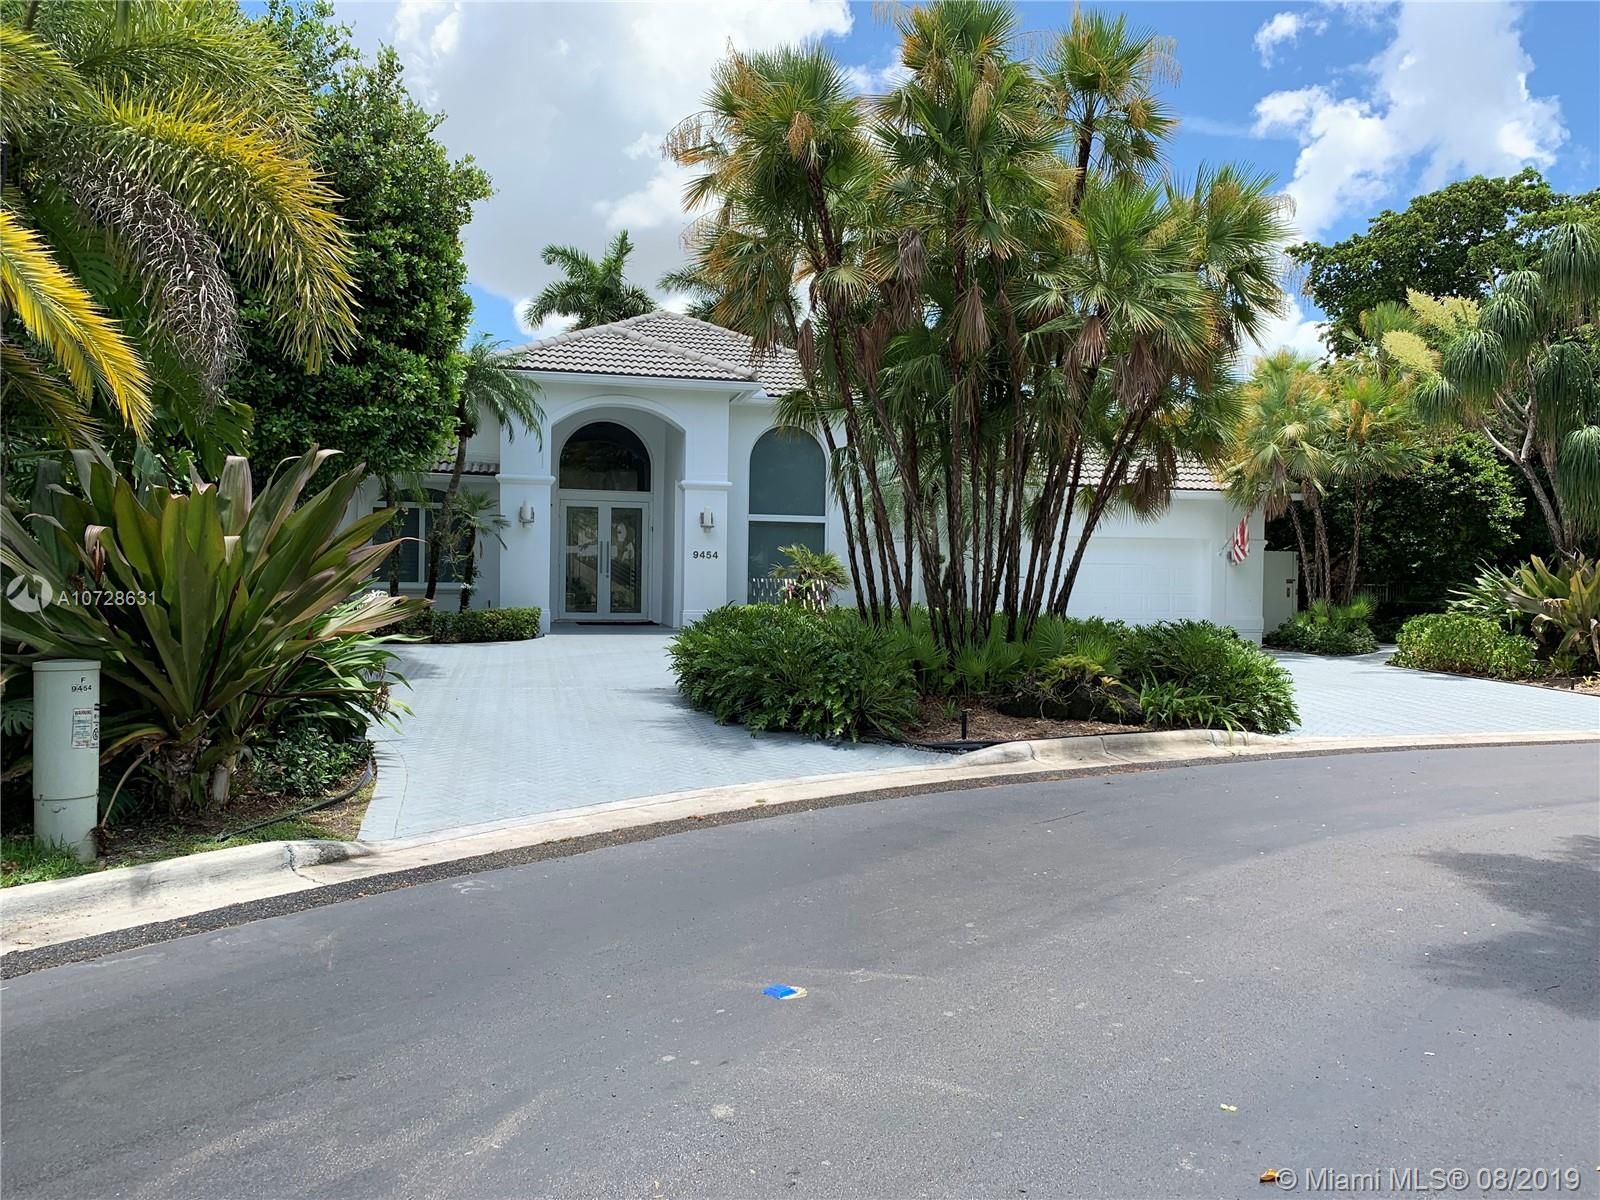 Property for sale at 9454 NW 52nd Doral Ln, Doral,  Florida 33178